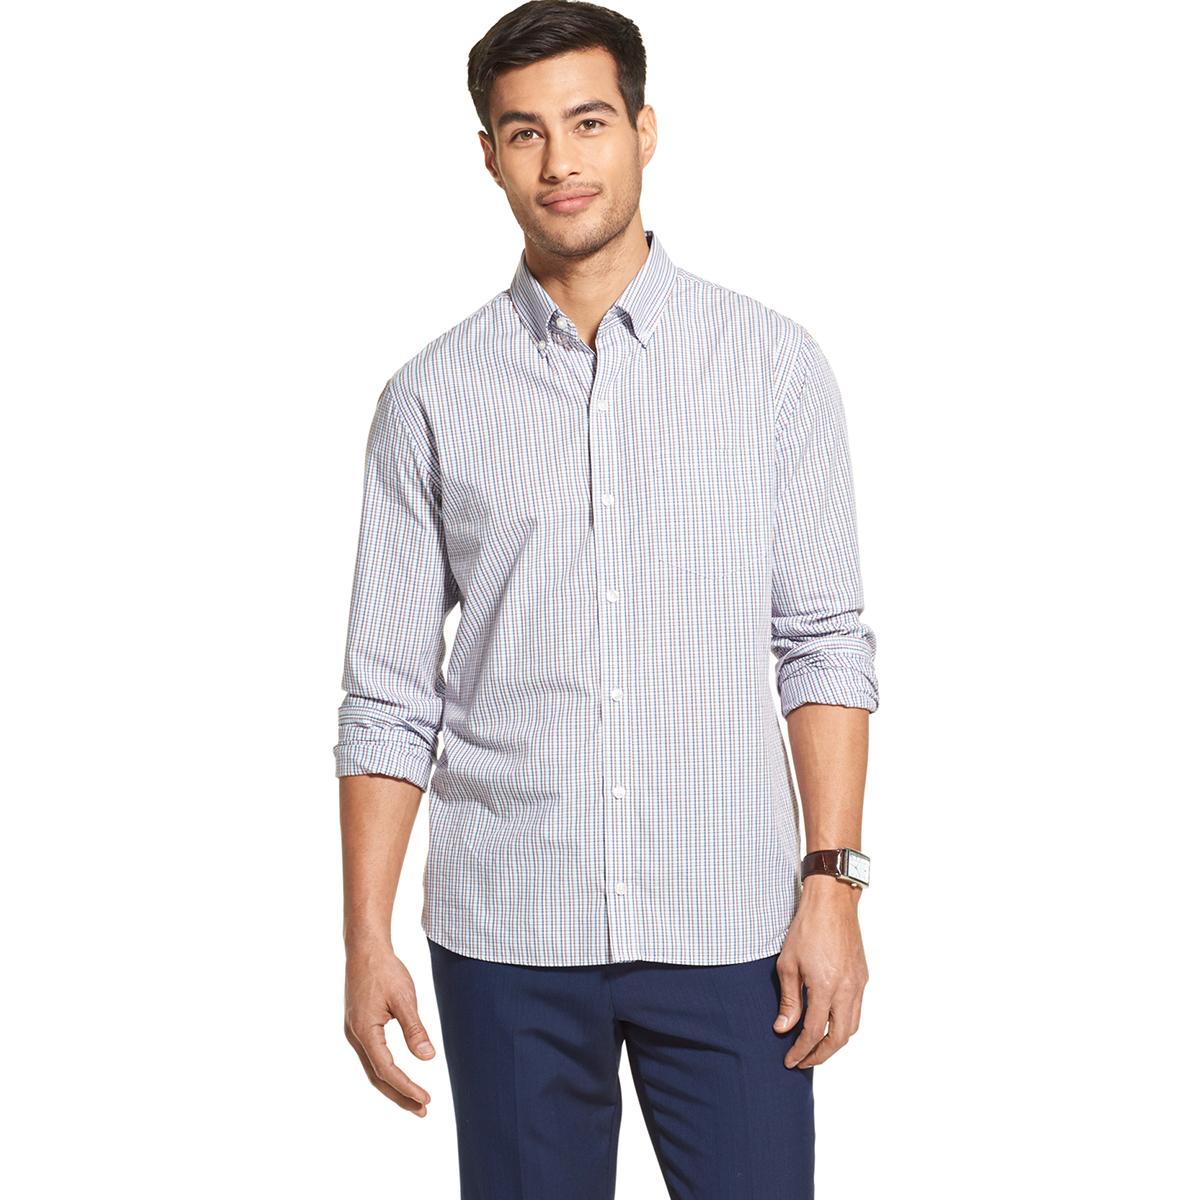 Van Heusen Men's Never Tuck Long-Sleeve Slim Fit Button-Front Shirt - White, M